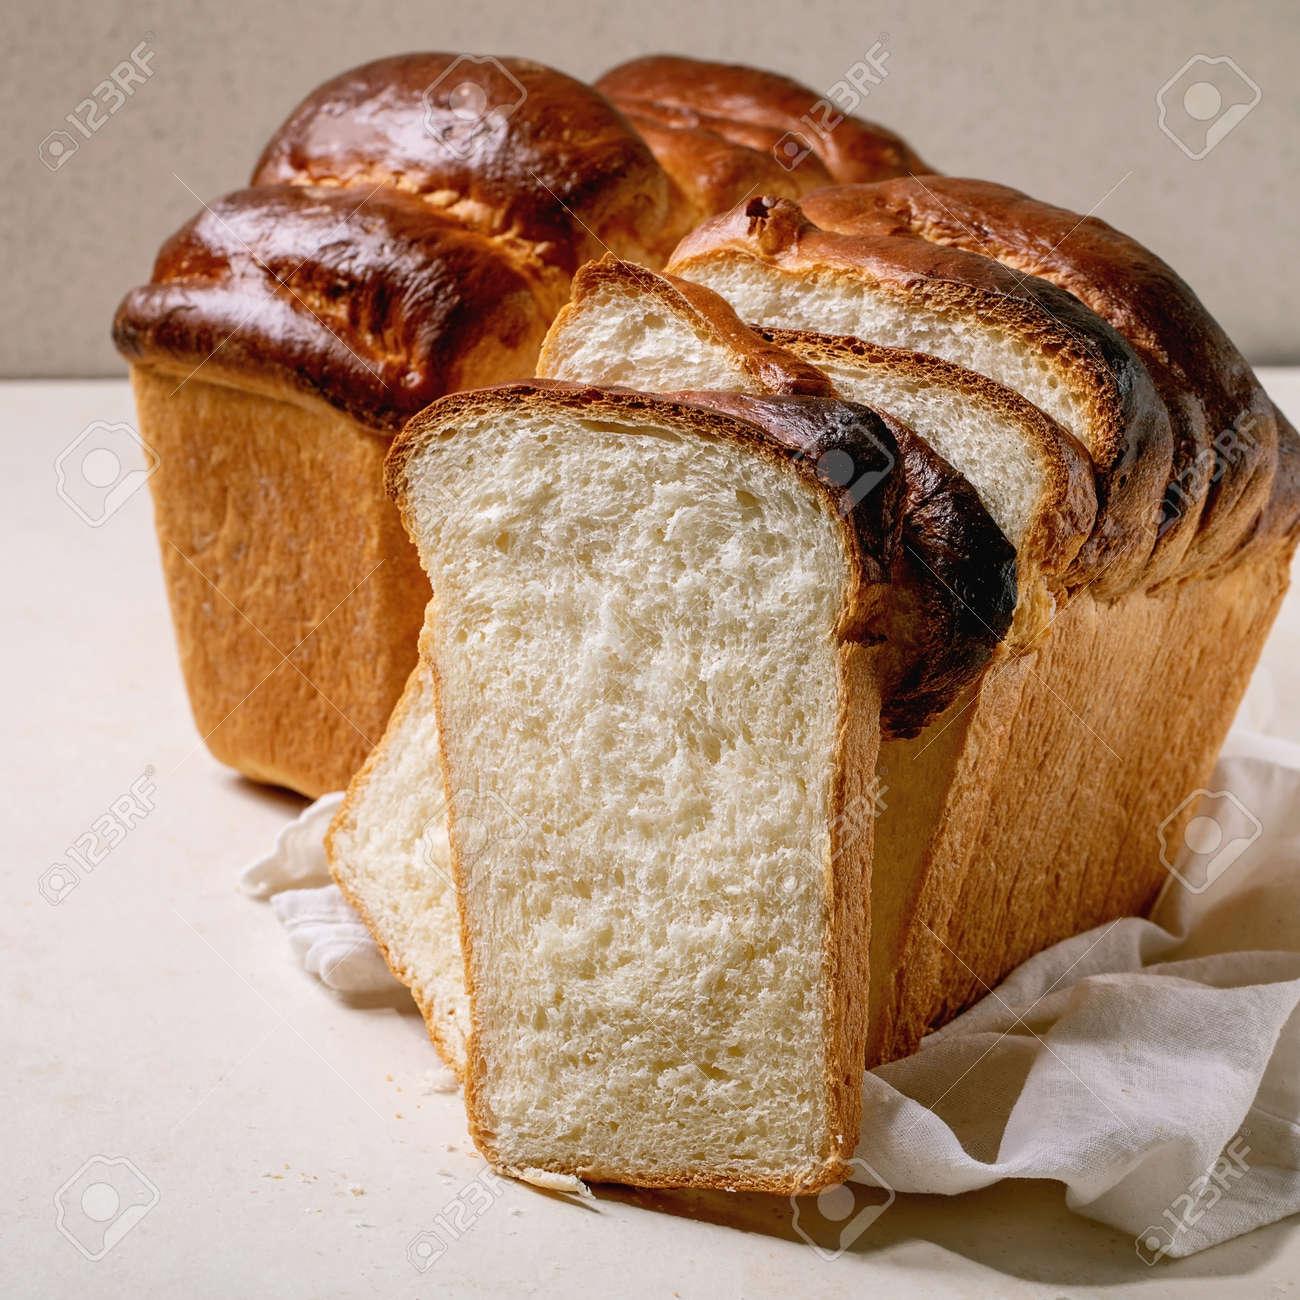 Homemade Hokkaido wheat toast bread whole and sliced on white cloth on table. Square - 173053451